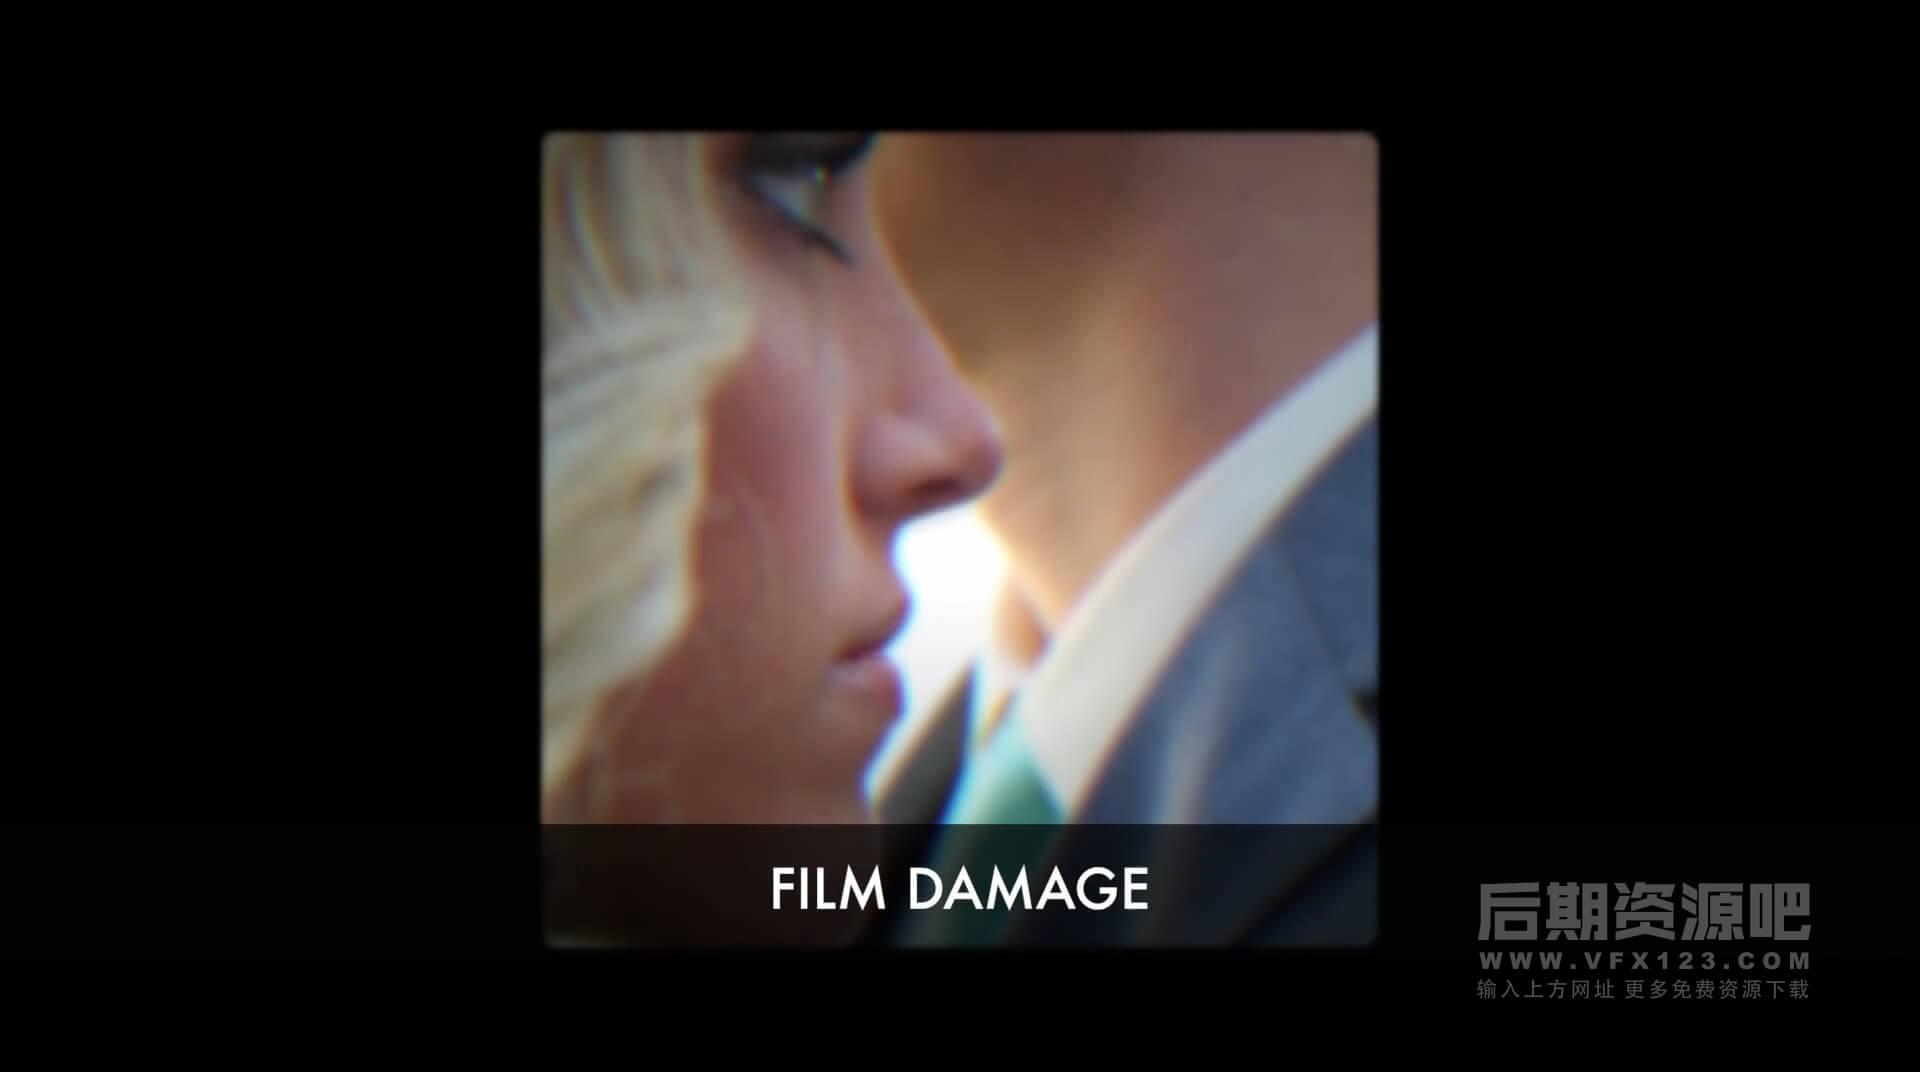 Fcpx插件 复古电影胶片幻灯机播放效果+转场 支持M1 CineFlare Film Strip